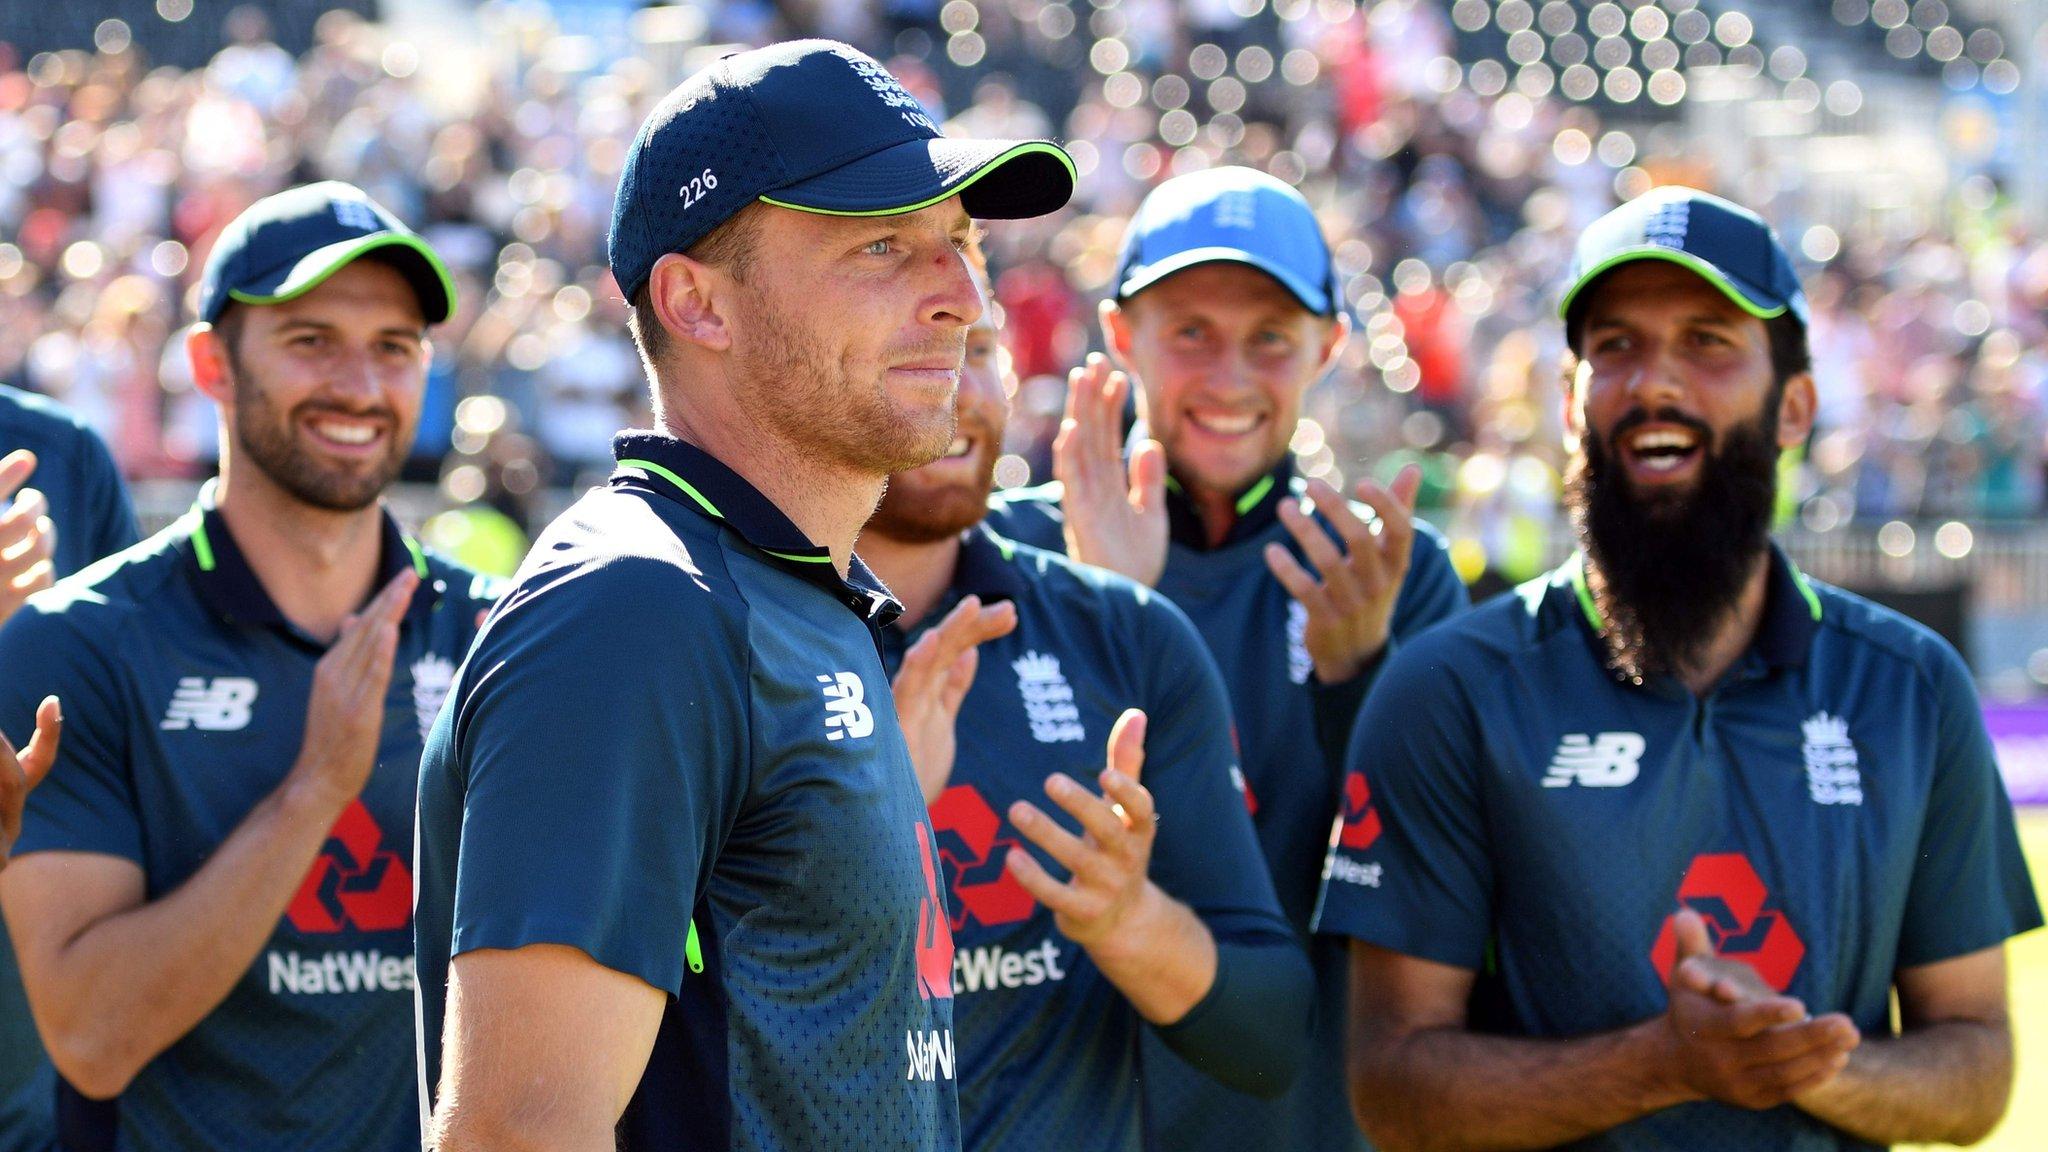 Jos Buttler gives England their best chance of winning World Cup - Michael Vaughan